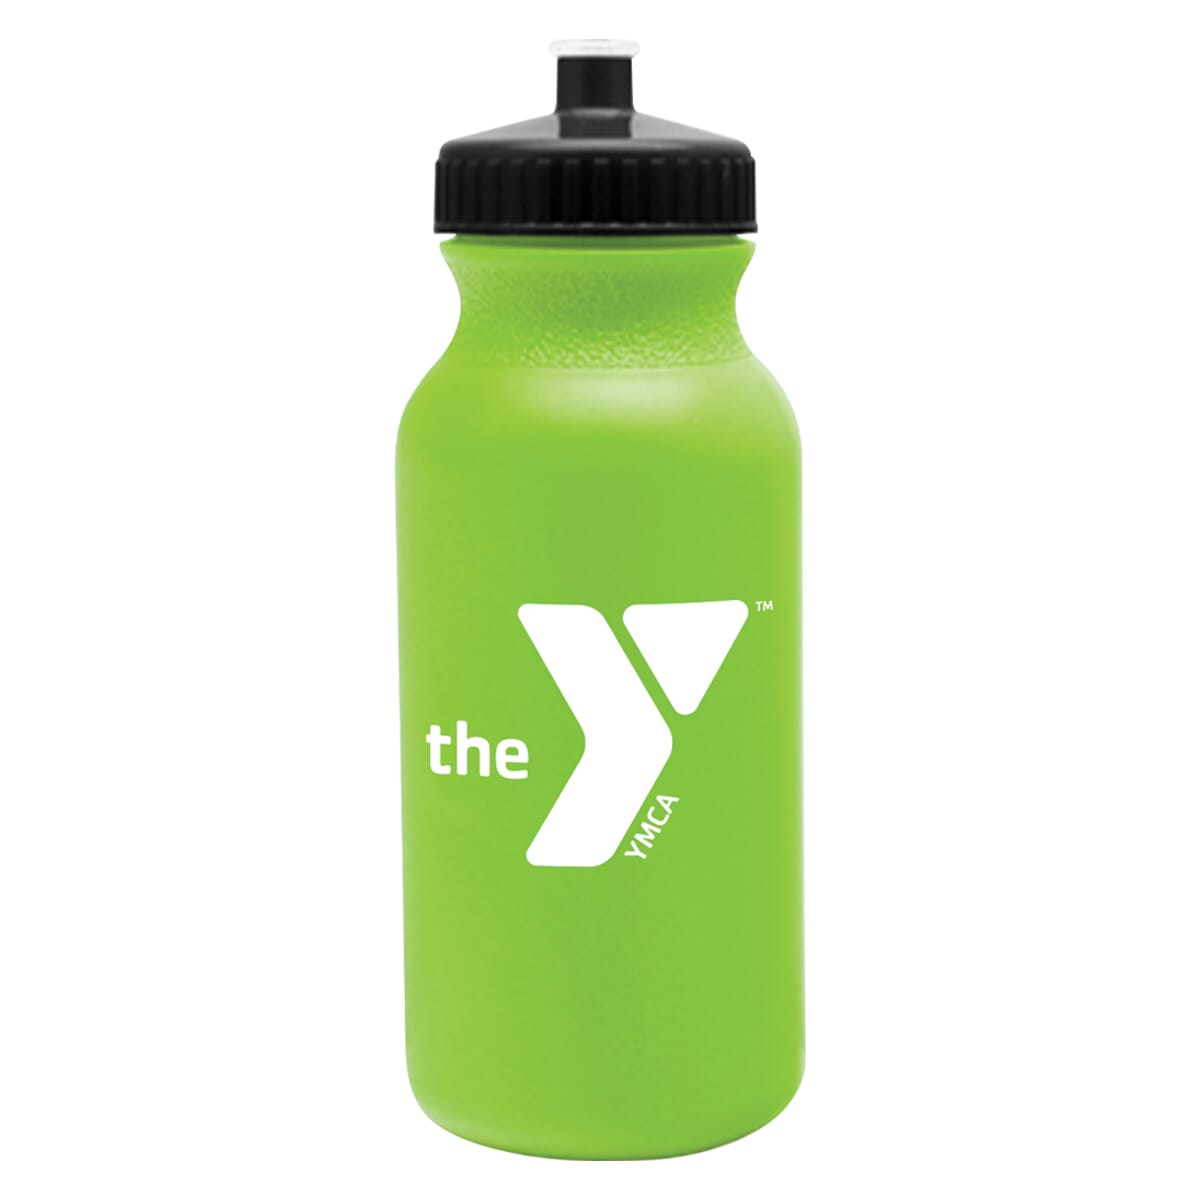 100 Bulk Pack 20 Ounce Water Bottles White Bottle With Green Lids USA Made